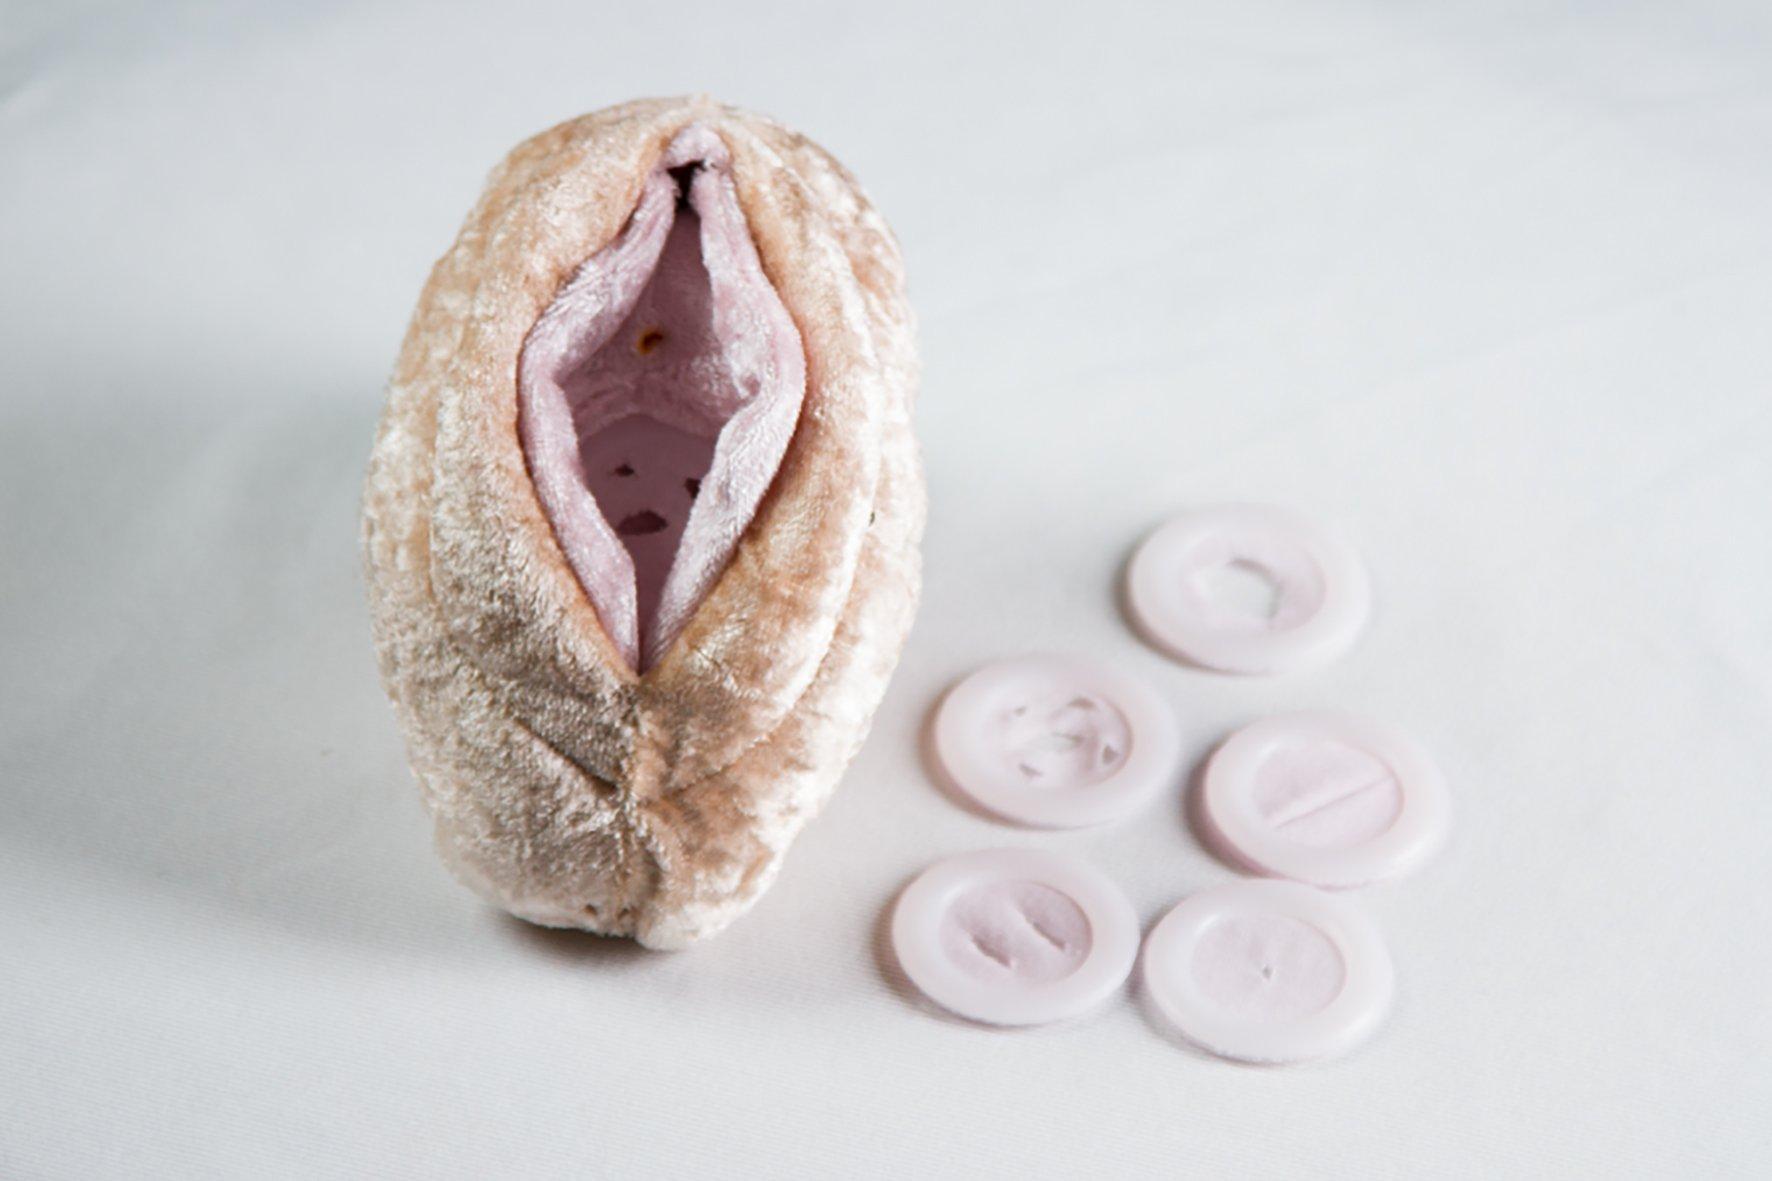 Jungfernhäutchen (Hymen)